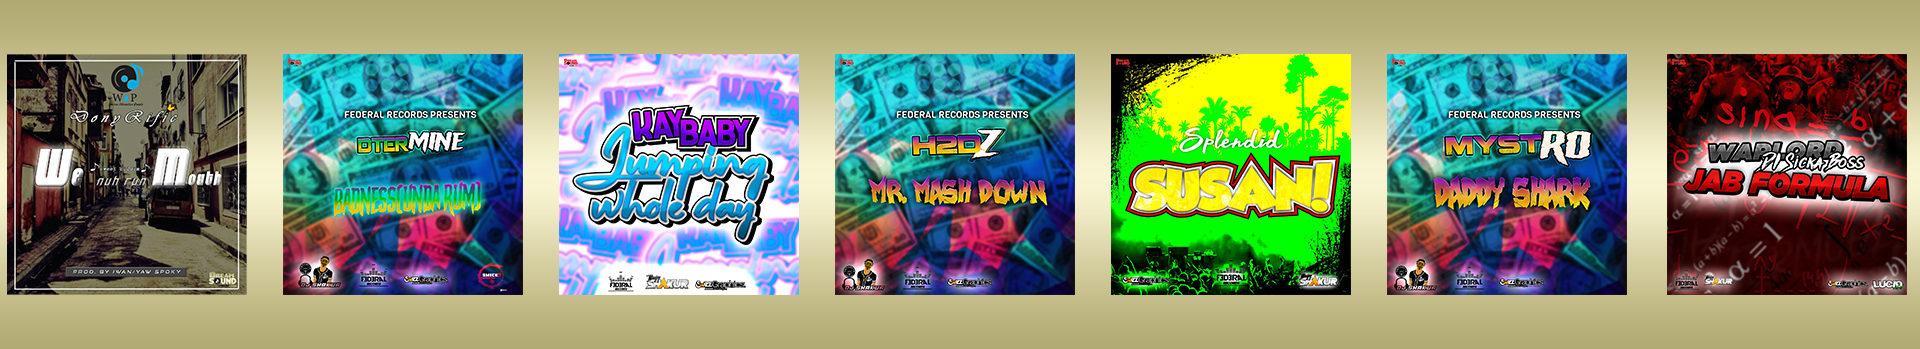 Dream Sound Media